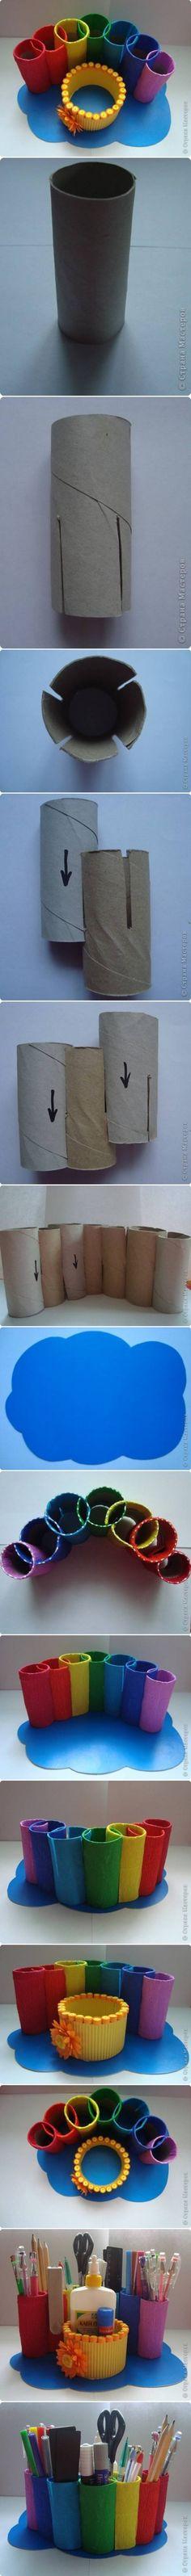 DIY Rainbow Desk Organizer from Toilet Paper Roll | www.FabArtDIY.com